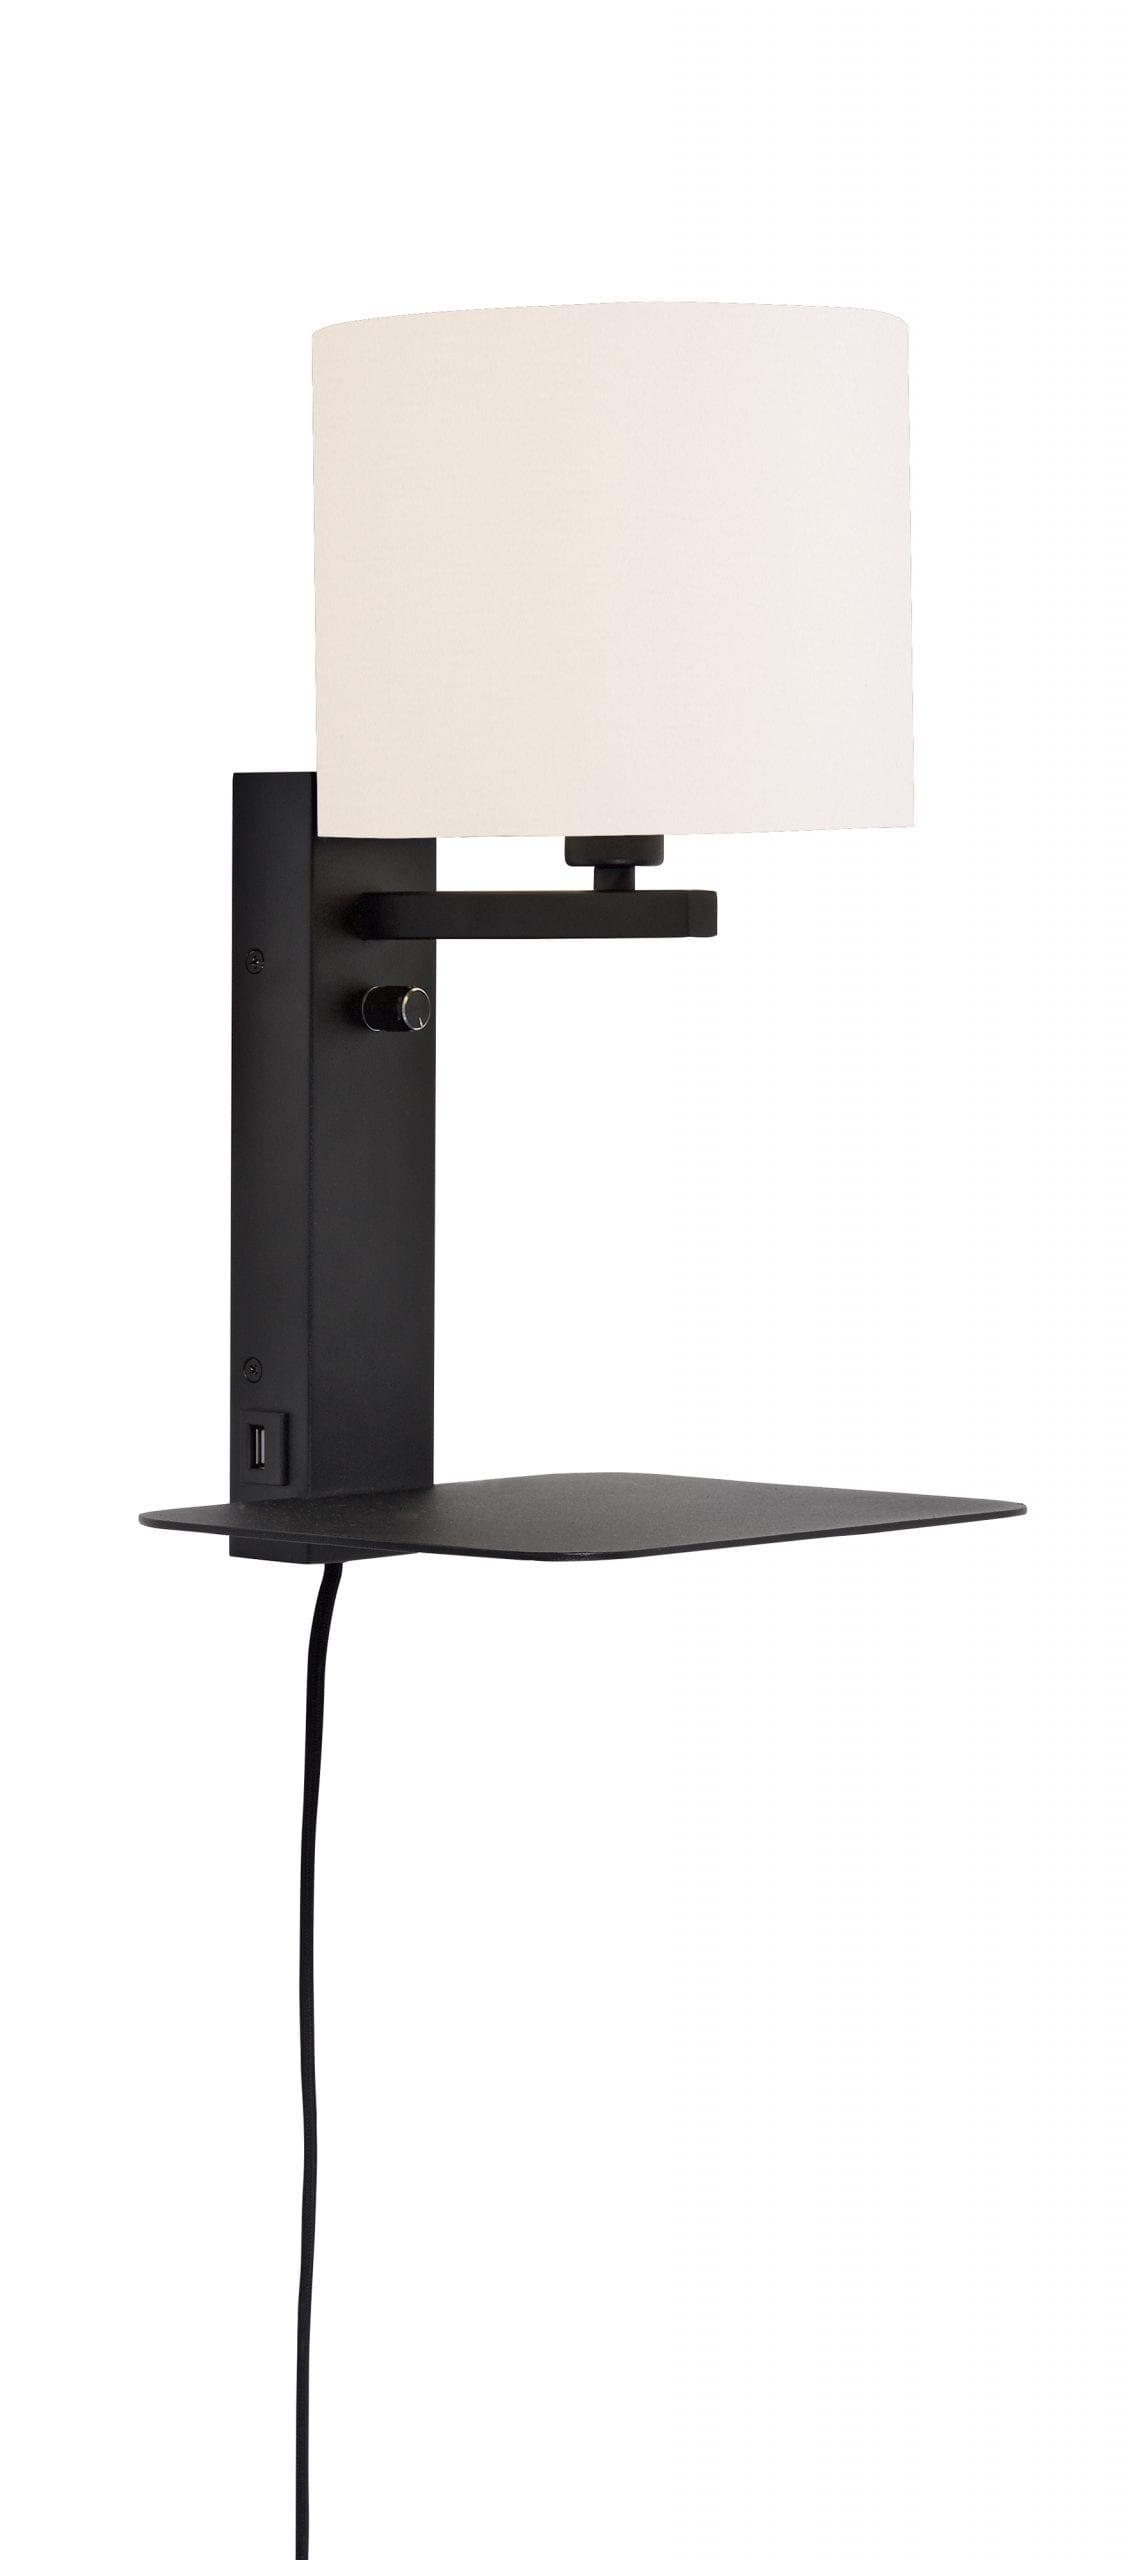 Wandlamp Florence - Black/White - 40cm